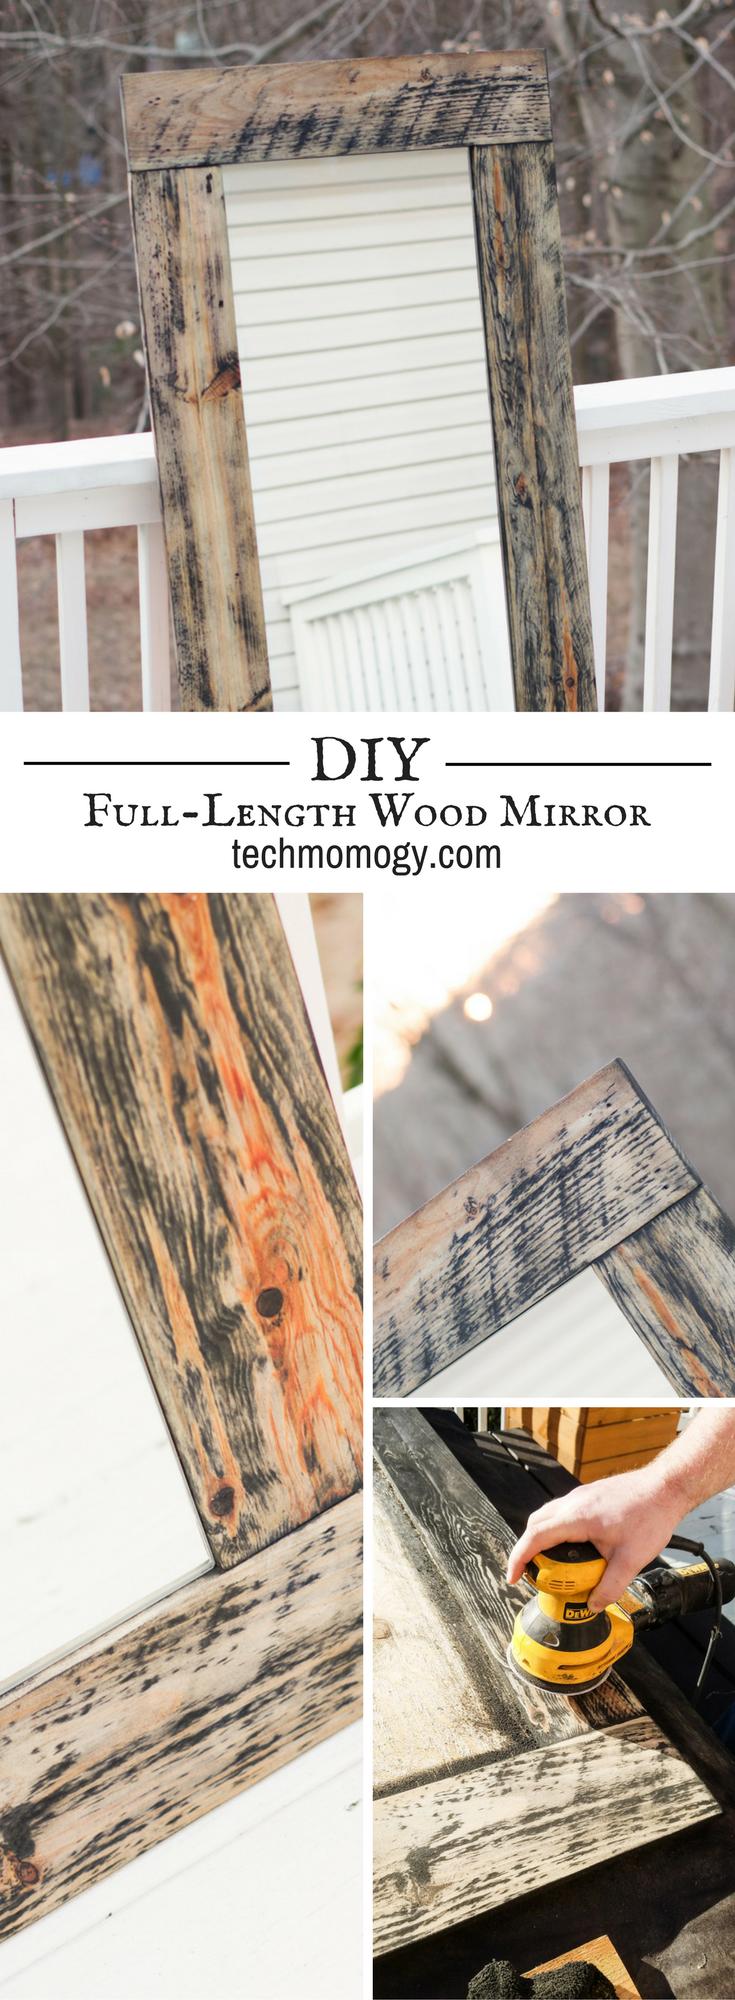 DIY Full-Length Wood Mirror - Techmomogy